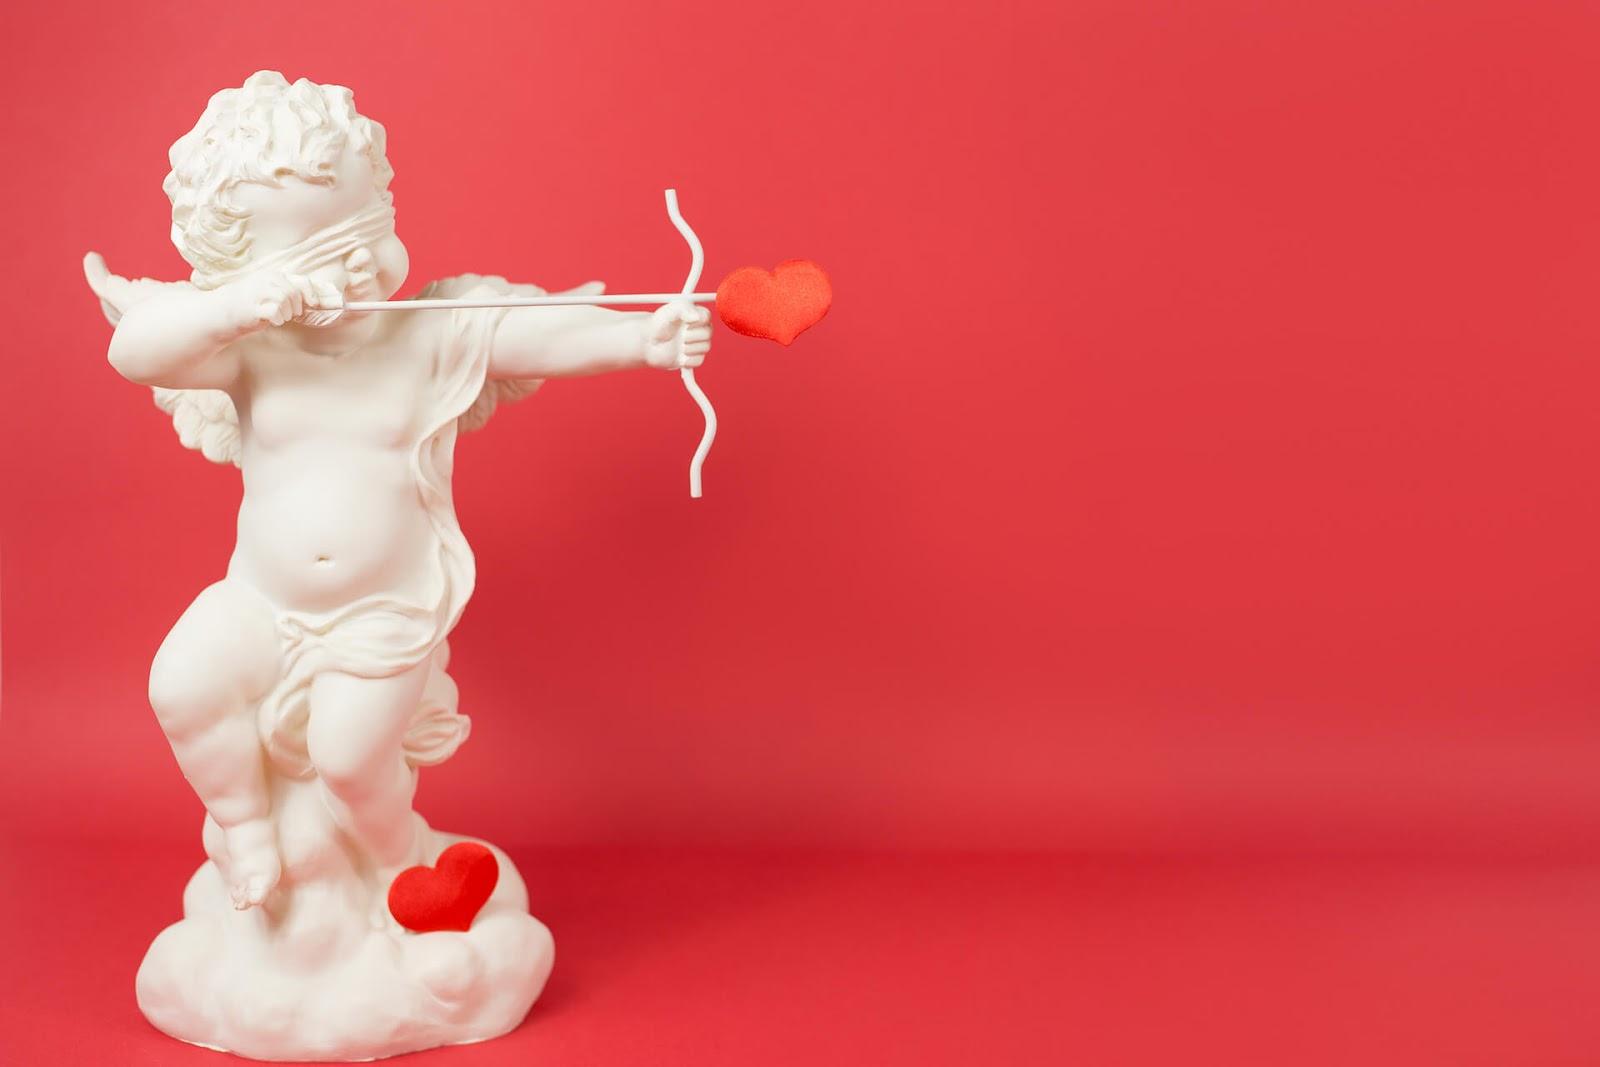 Cupid shooting his arrow blindly